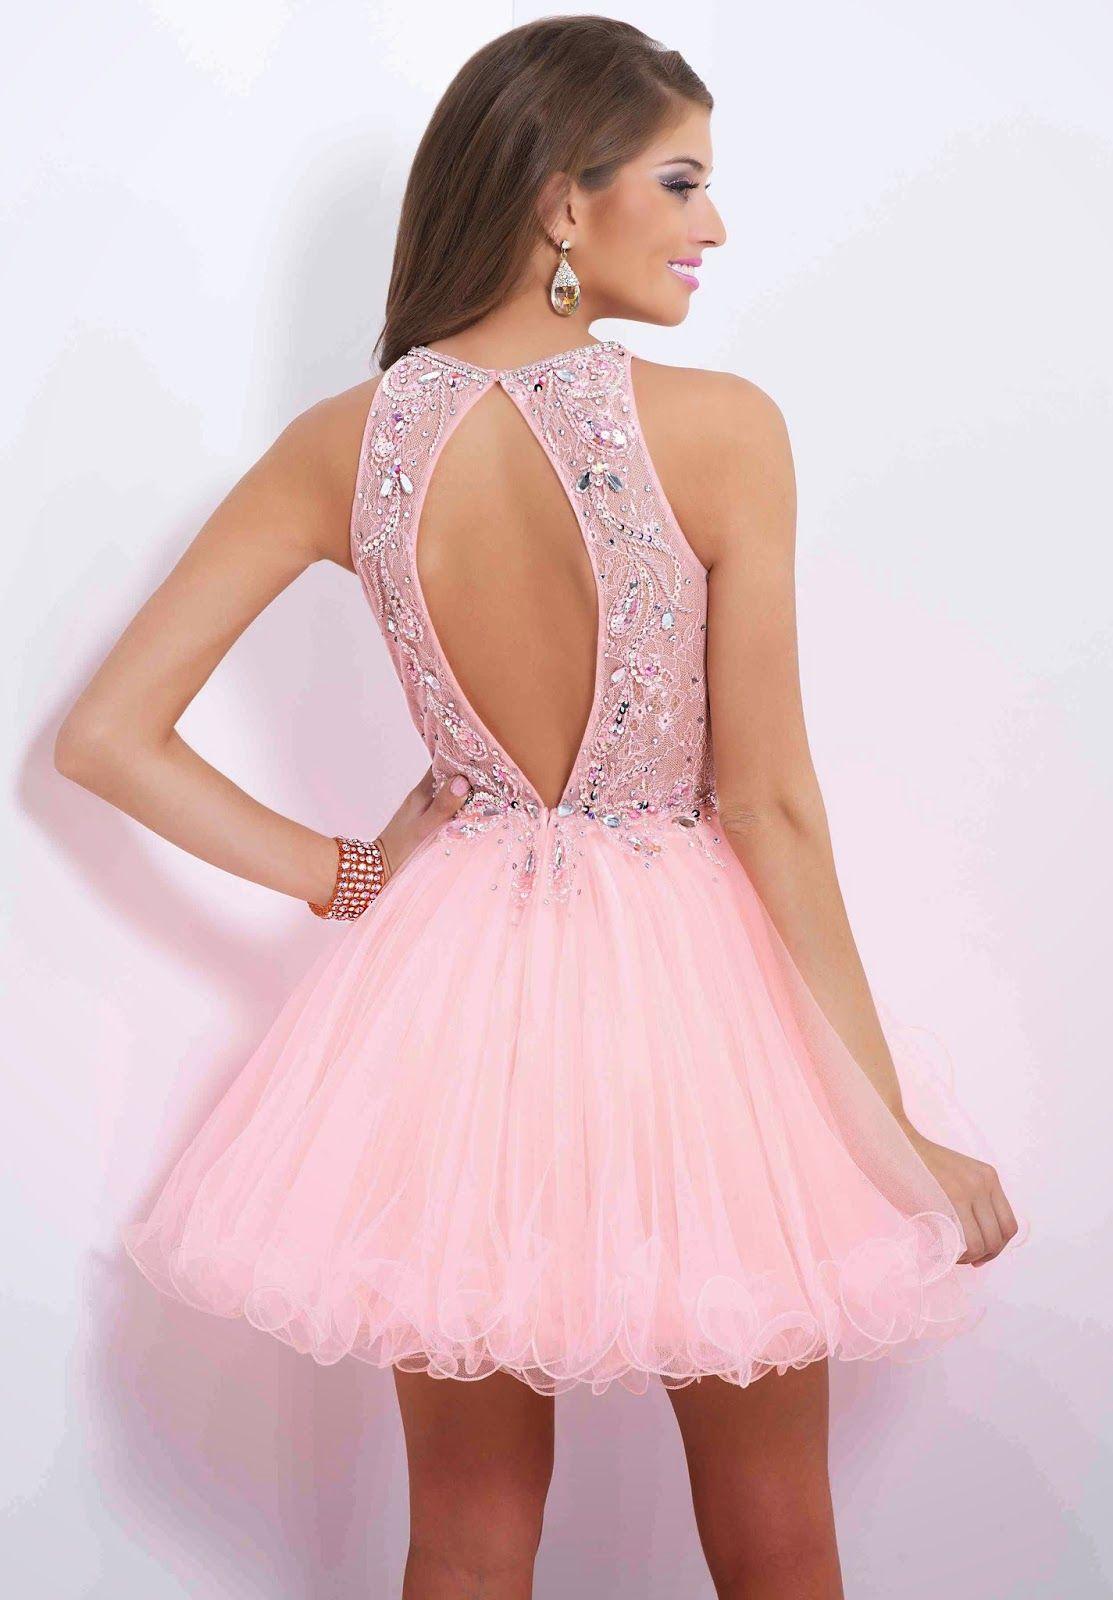 b8f69ecf1e Magníficos vestidos de noche para jovencitas